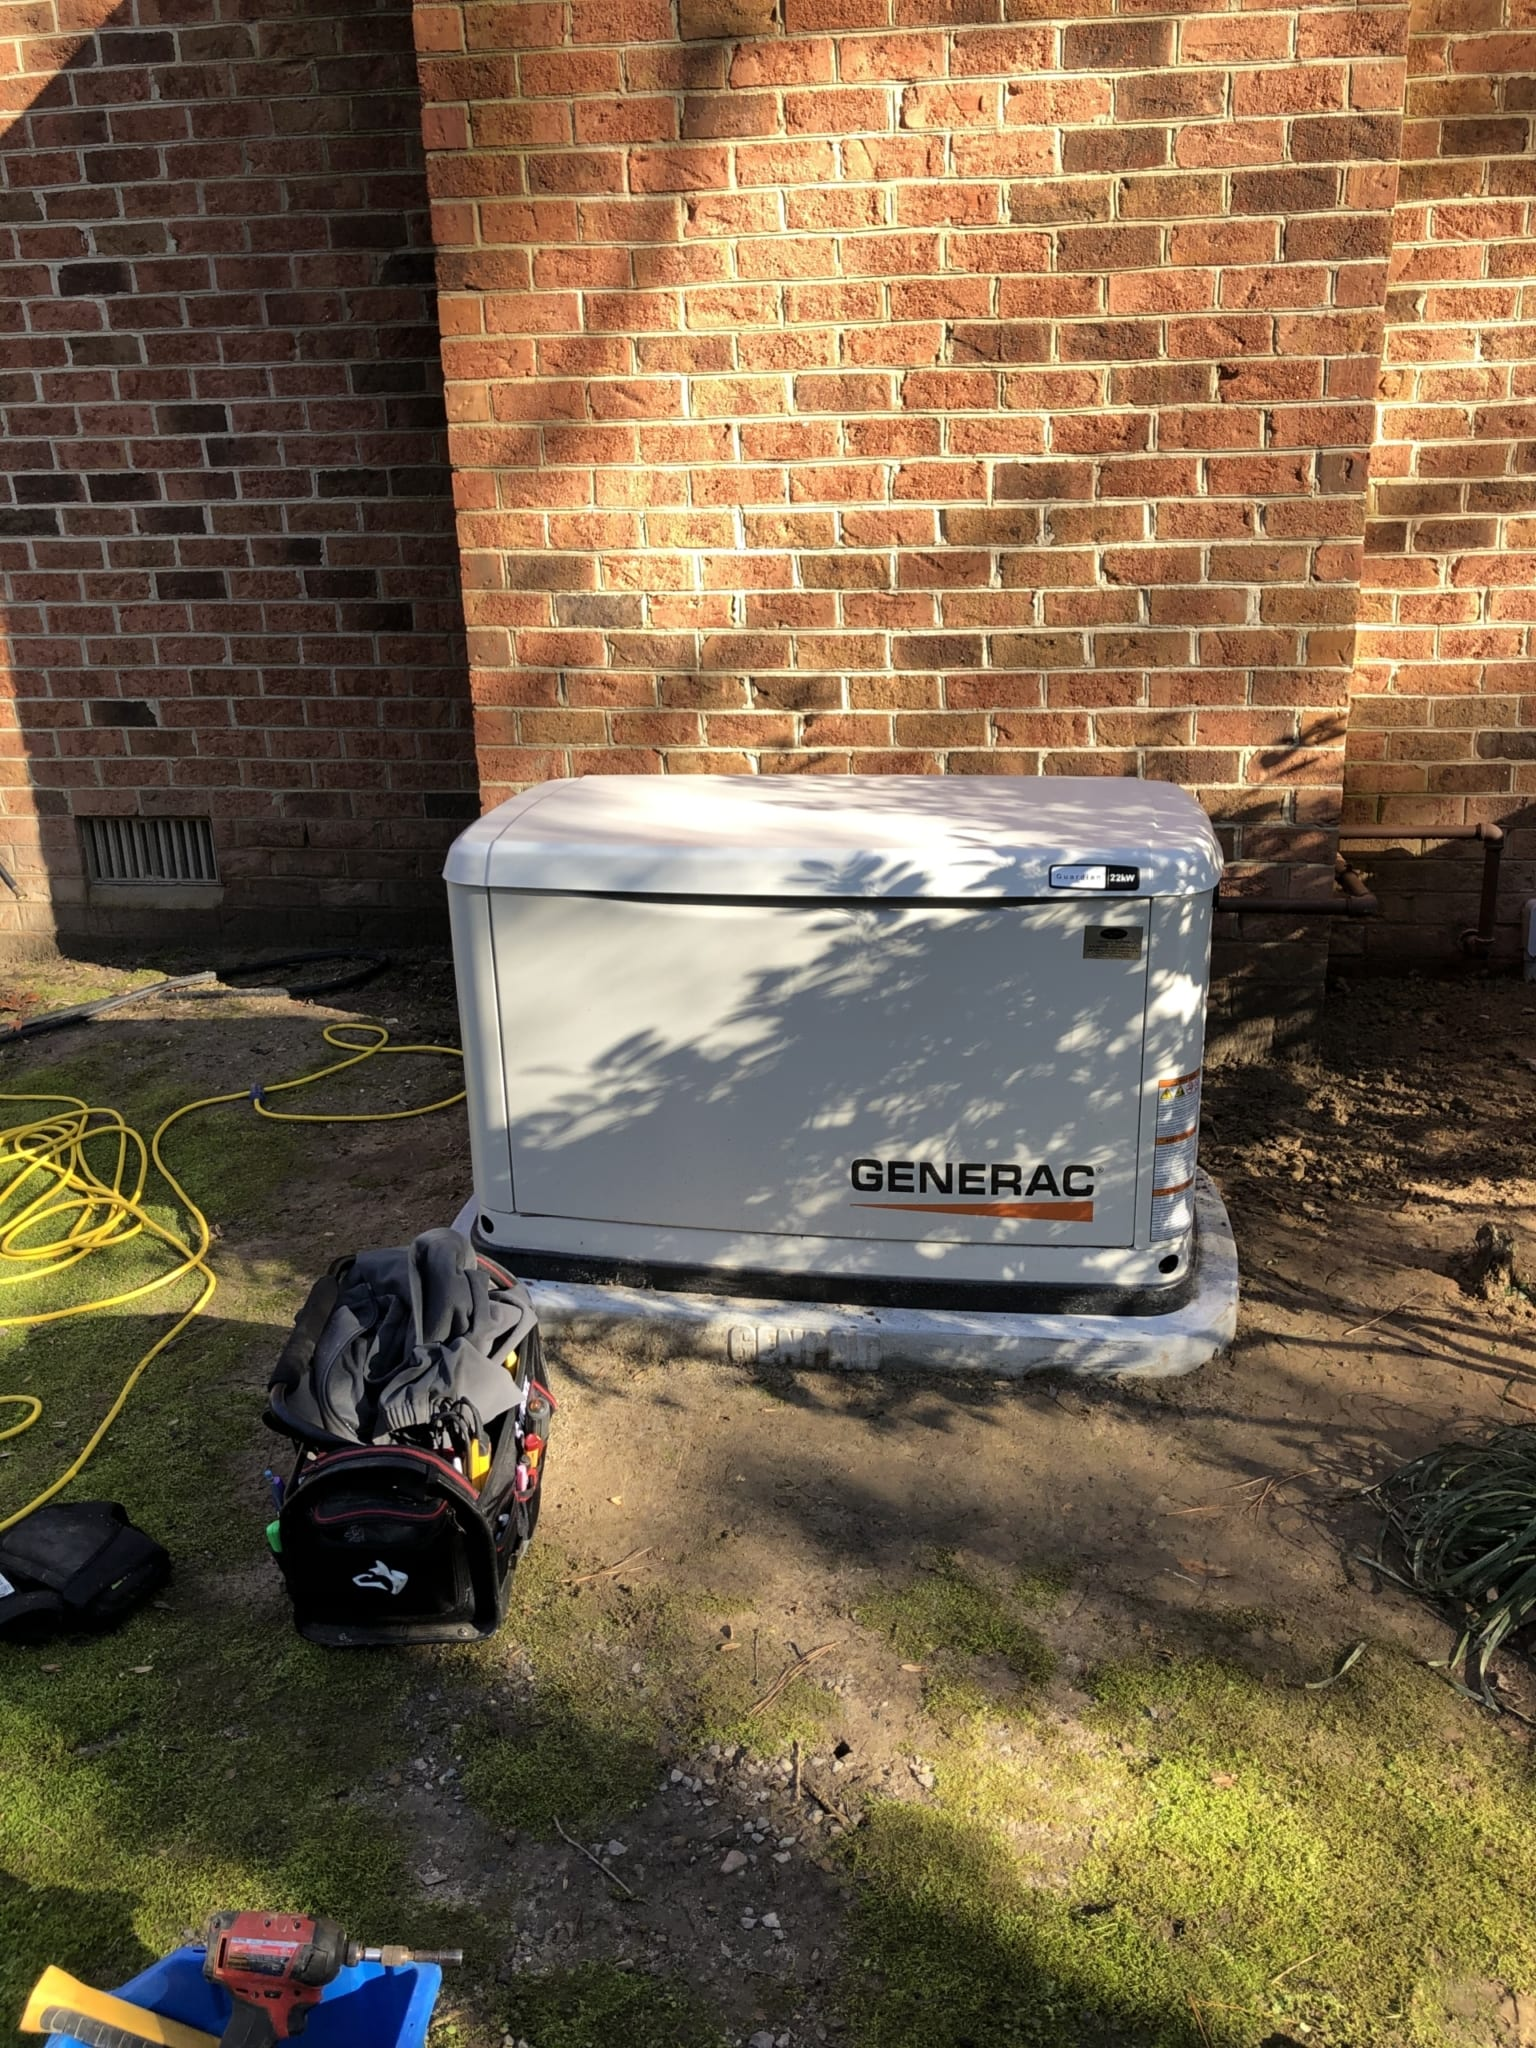 12.21.20 Chesterfield Generac Automatic Standby Generator